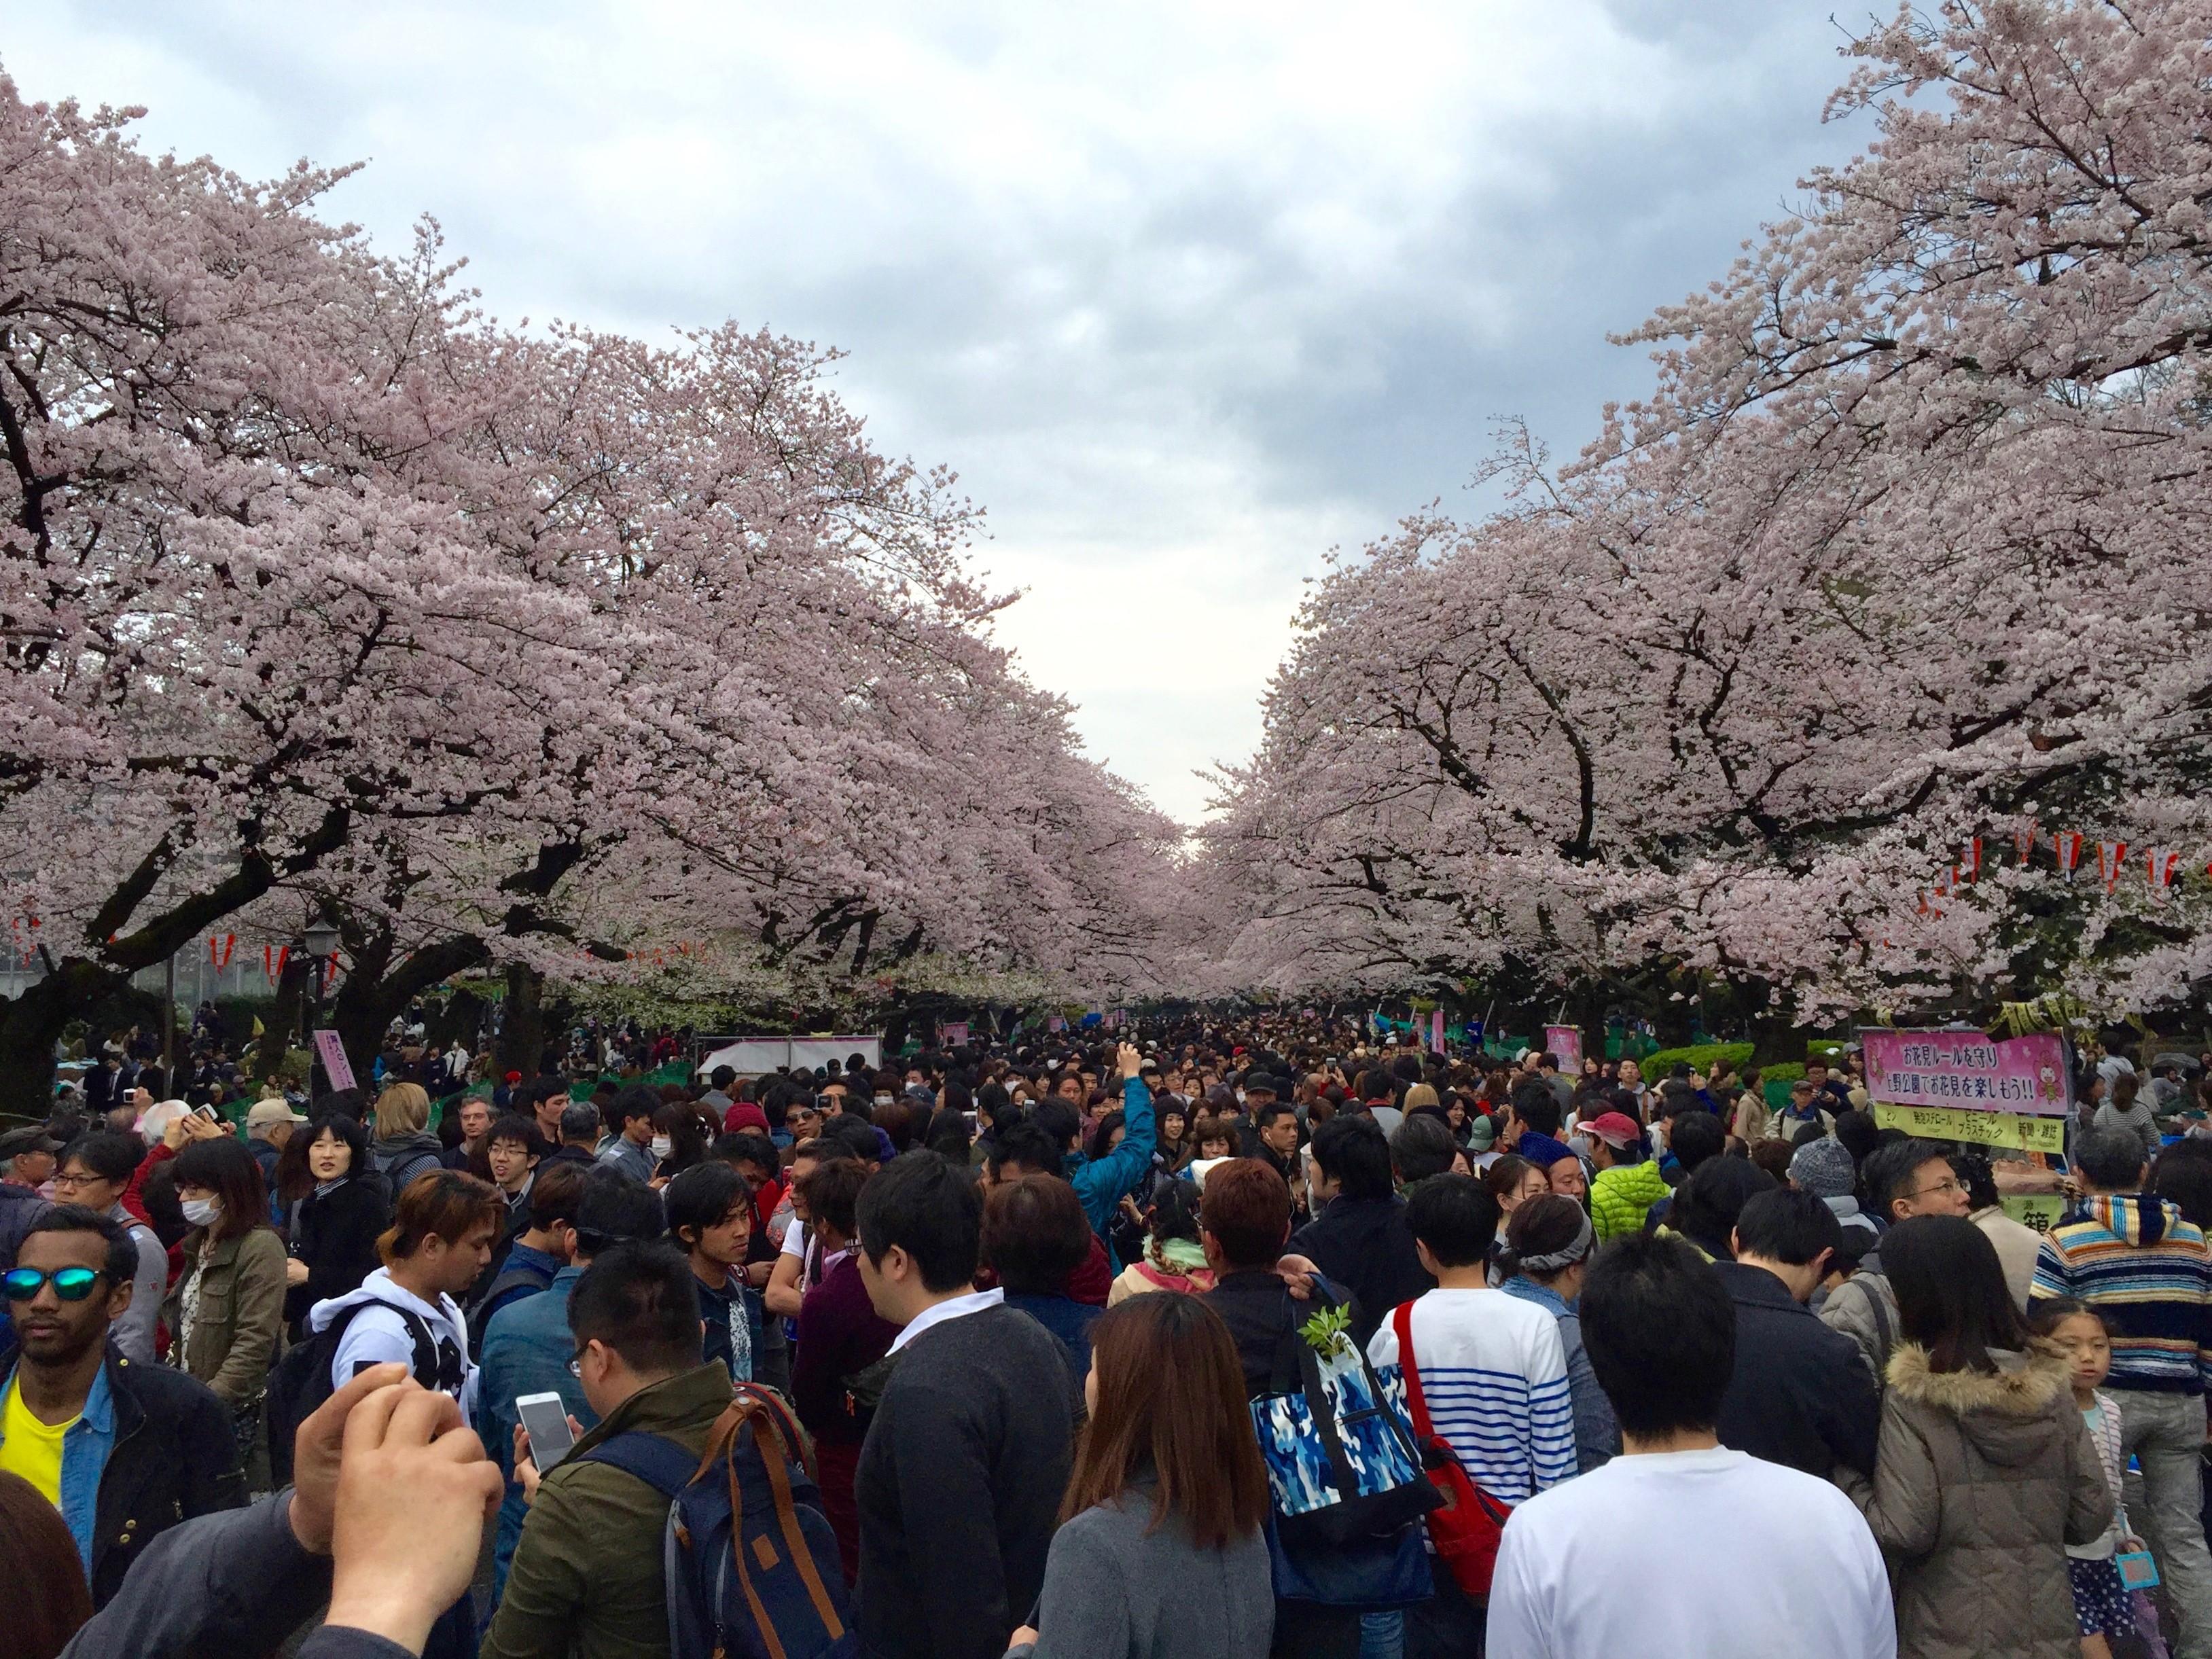 cherry blossom festival - HD3256×2442